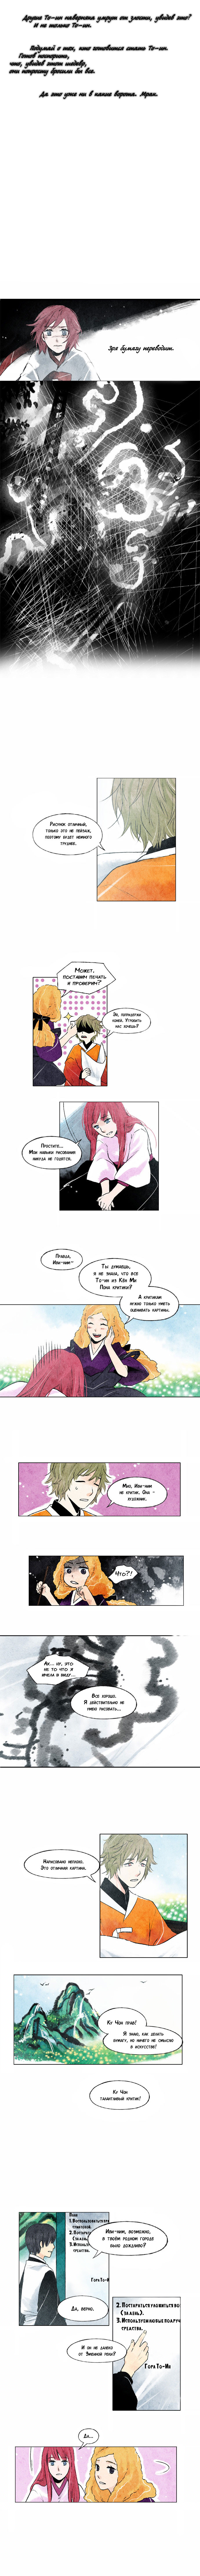 https://r1.ninemanga.com/comics/pic2/39/22503/1257042/1541334758488.jpg Page 3